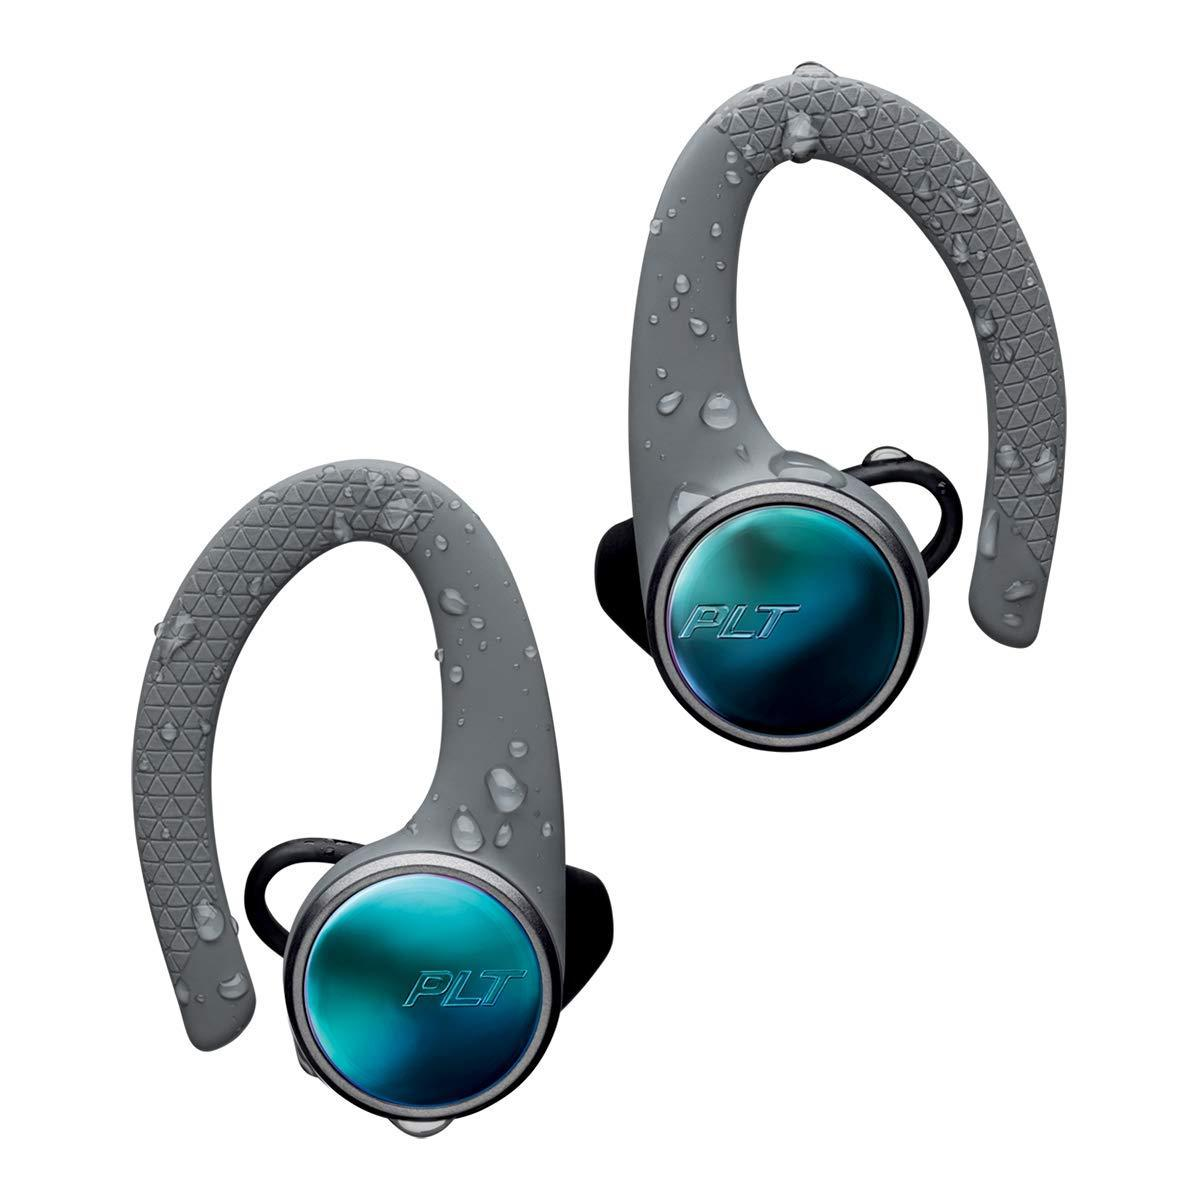 f790d6d9f46 Plantronics Backbeat Fit 3100 True Wireless Sport Earbuds